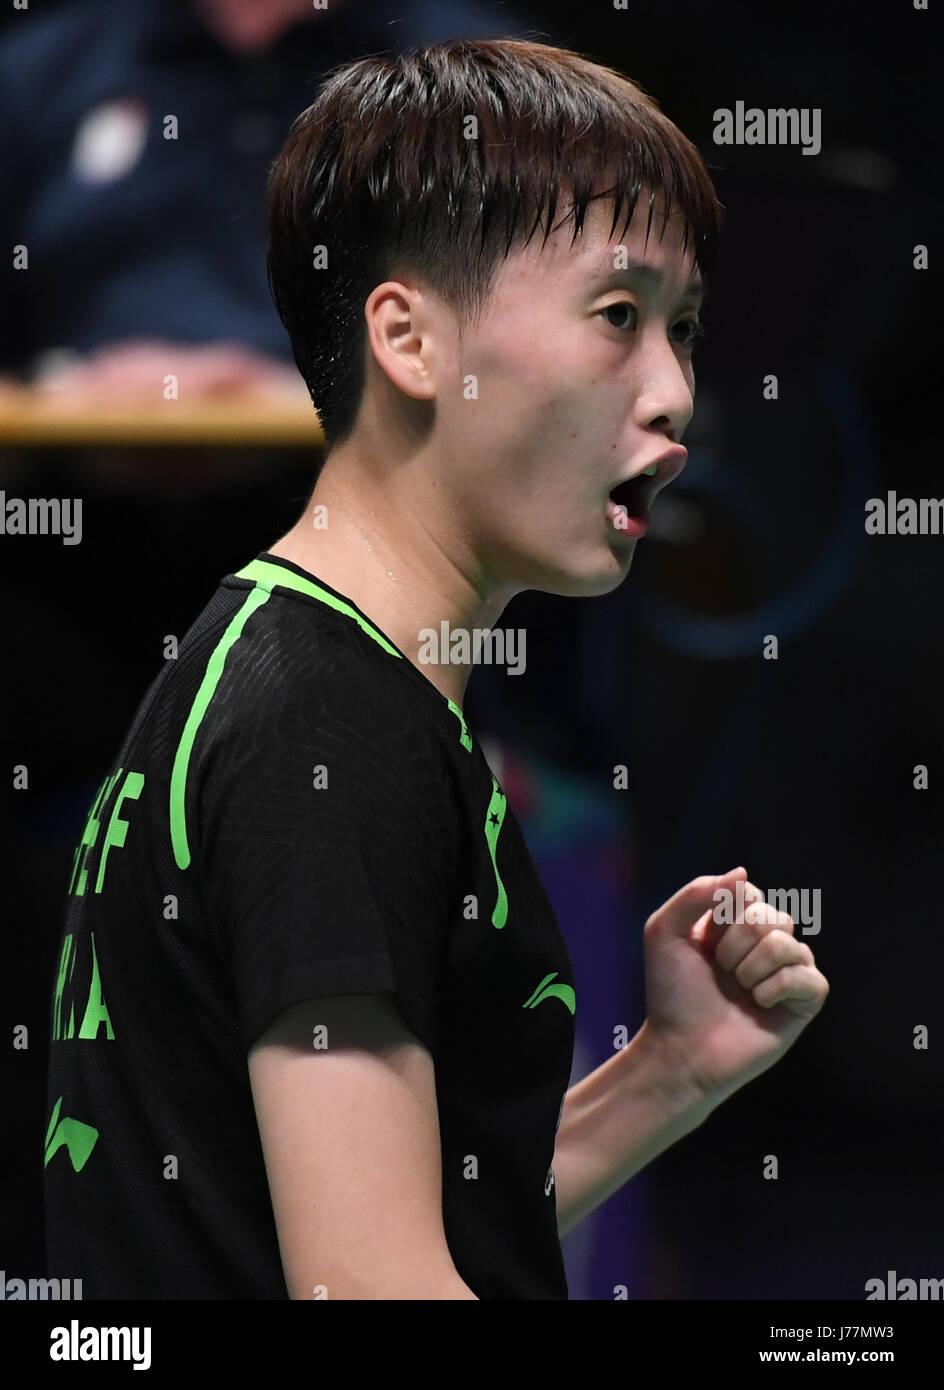 GOLD COAST May 24 2017 Xinhua China s Chen Yufei